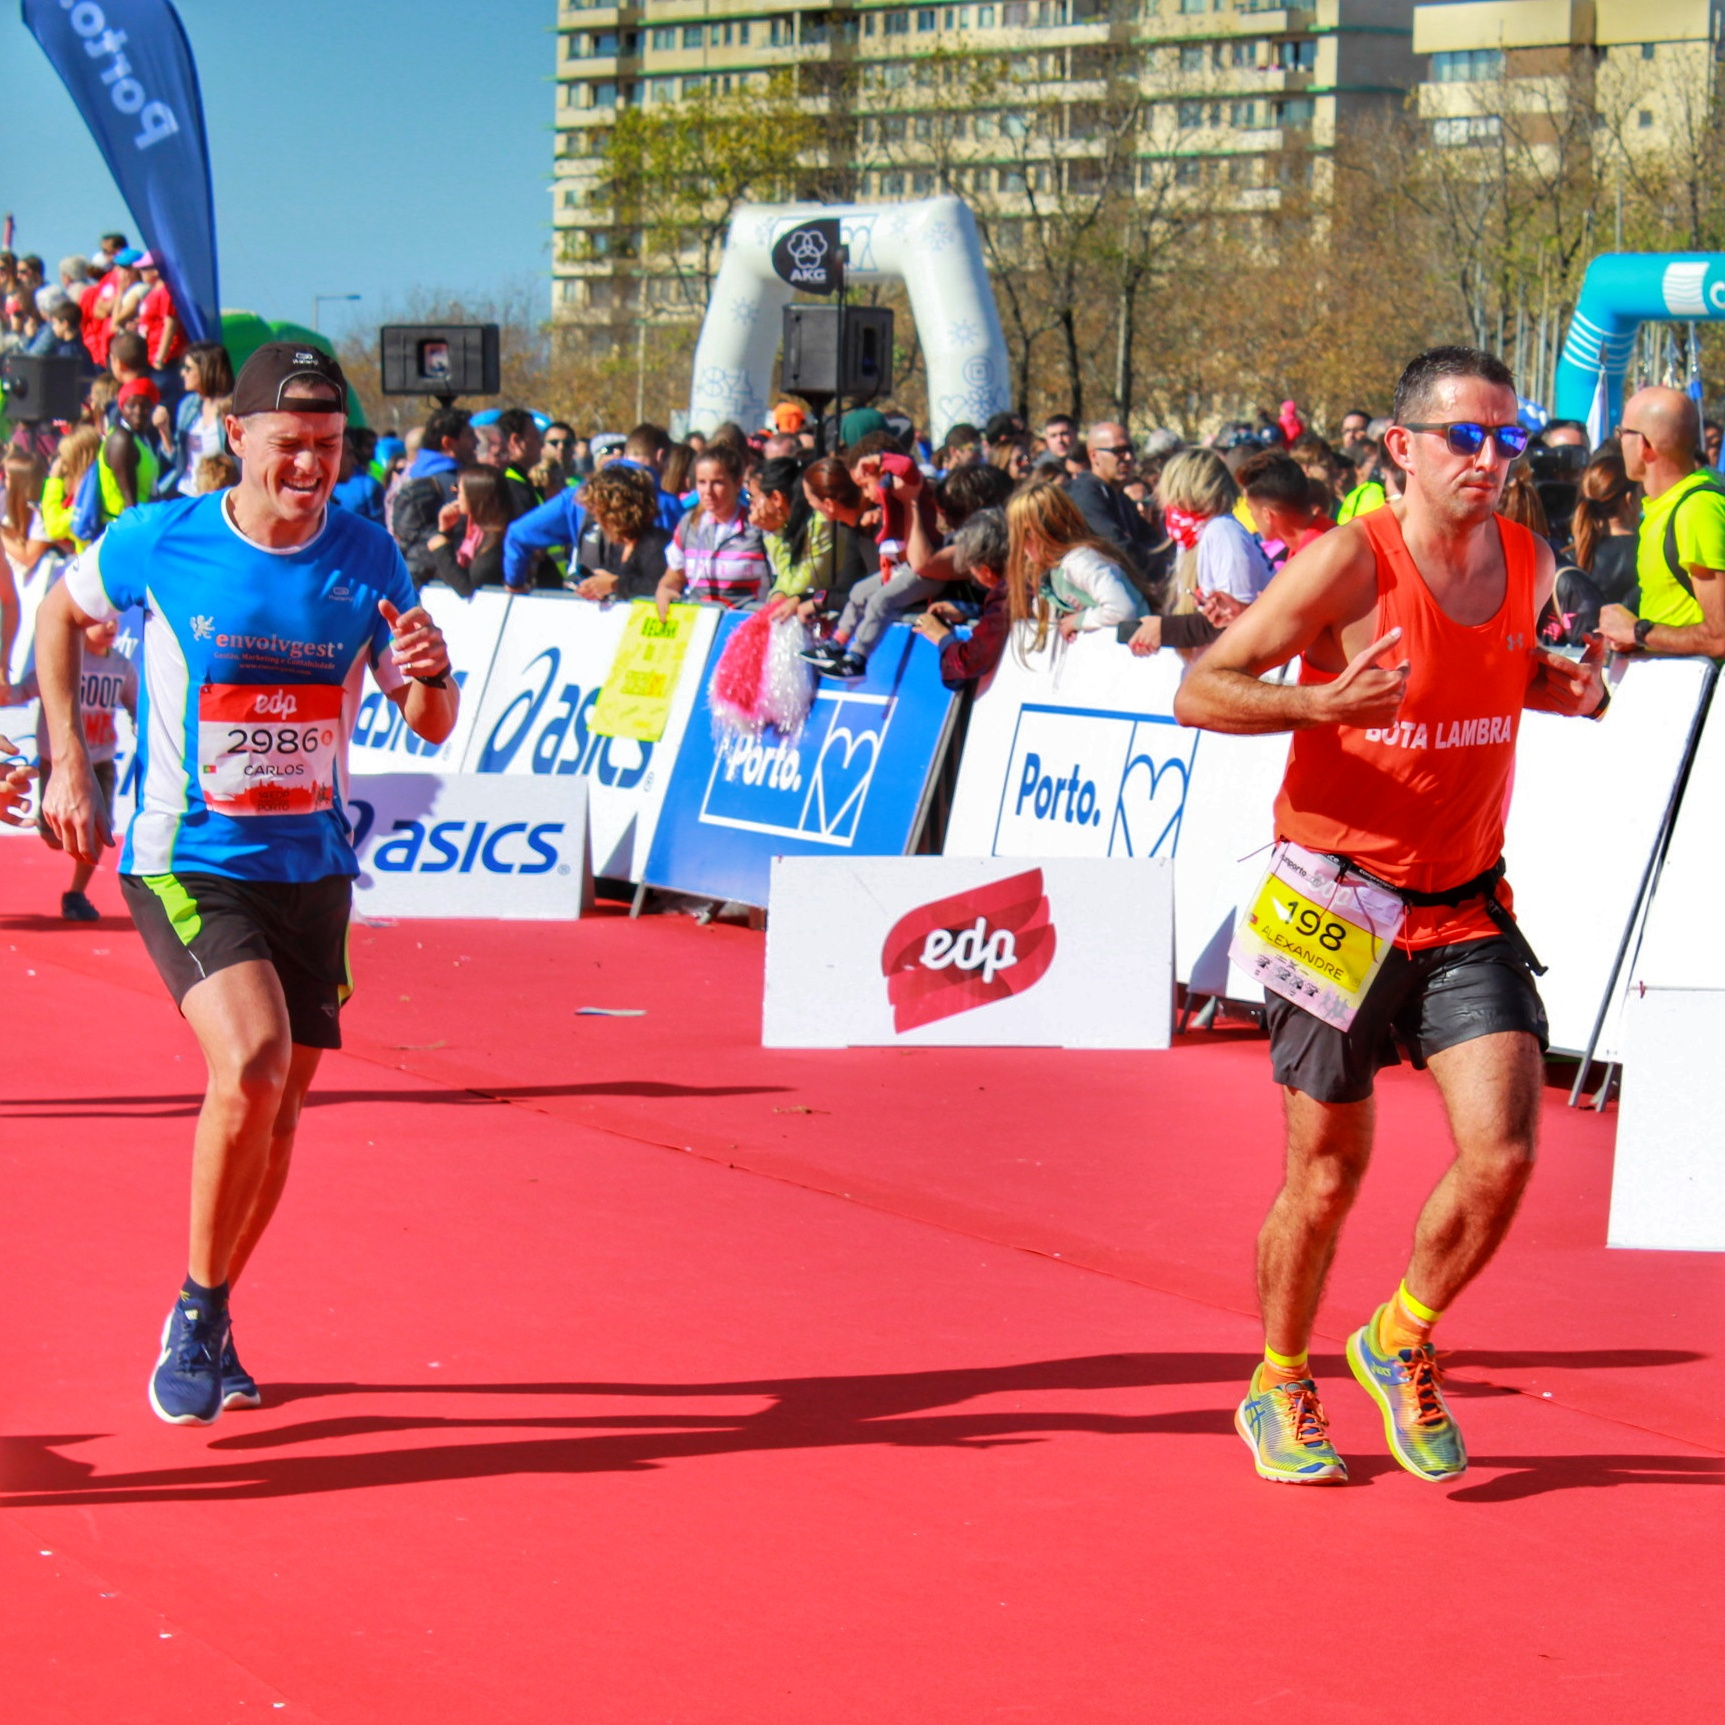 Maratona do Porto 2017-01.jpeg